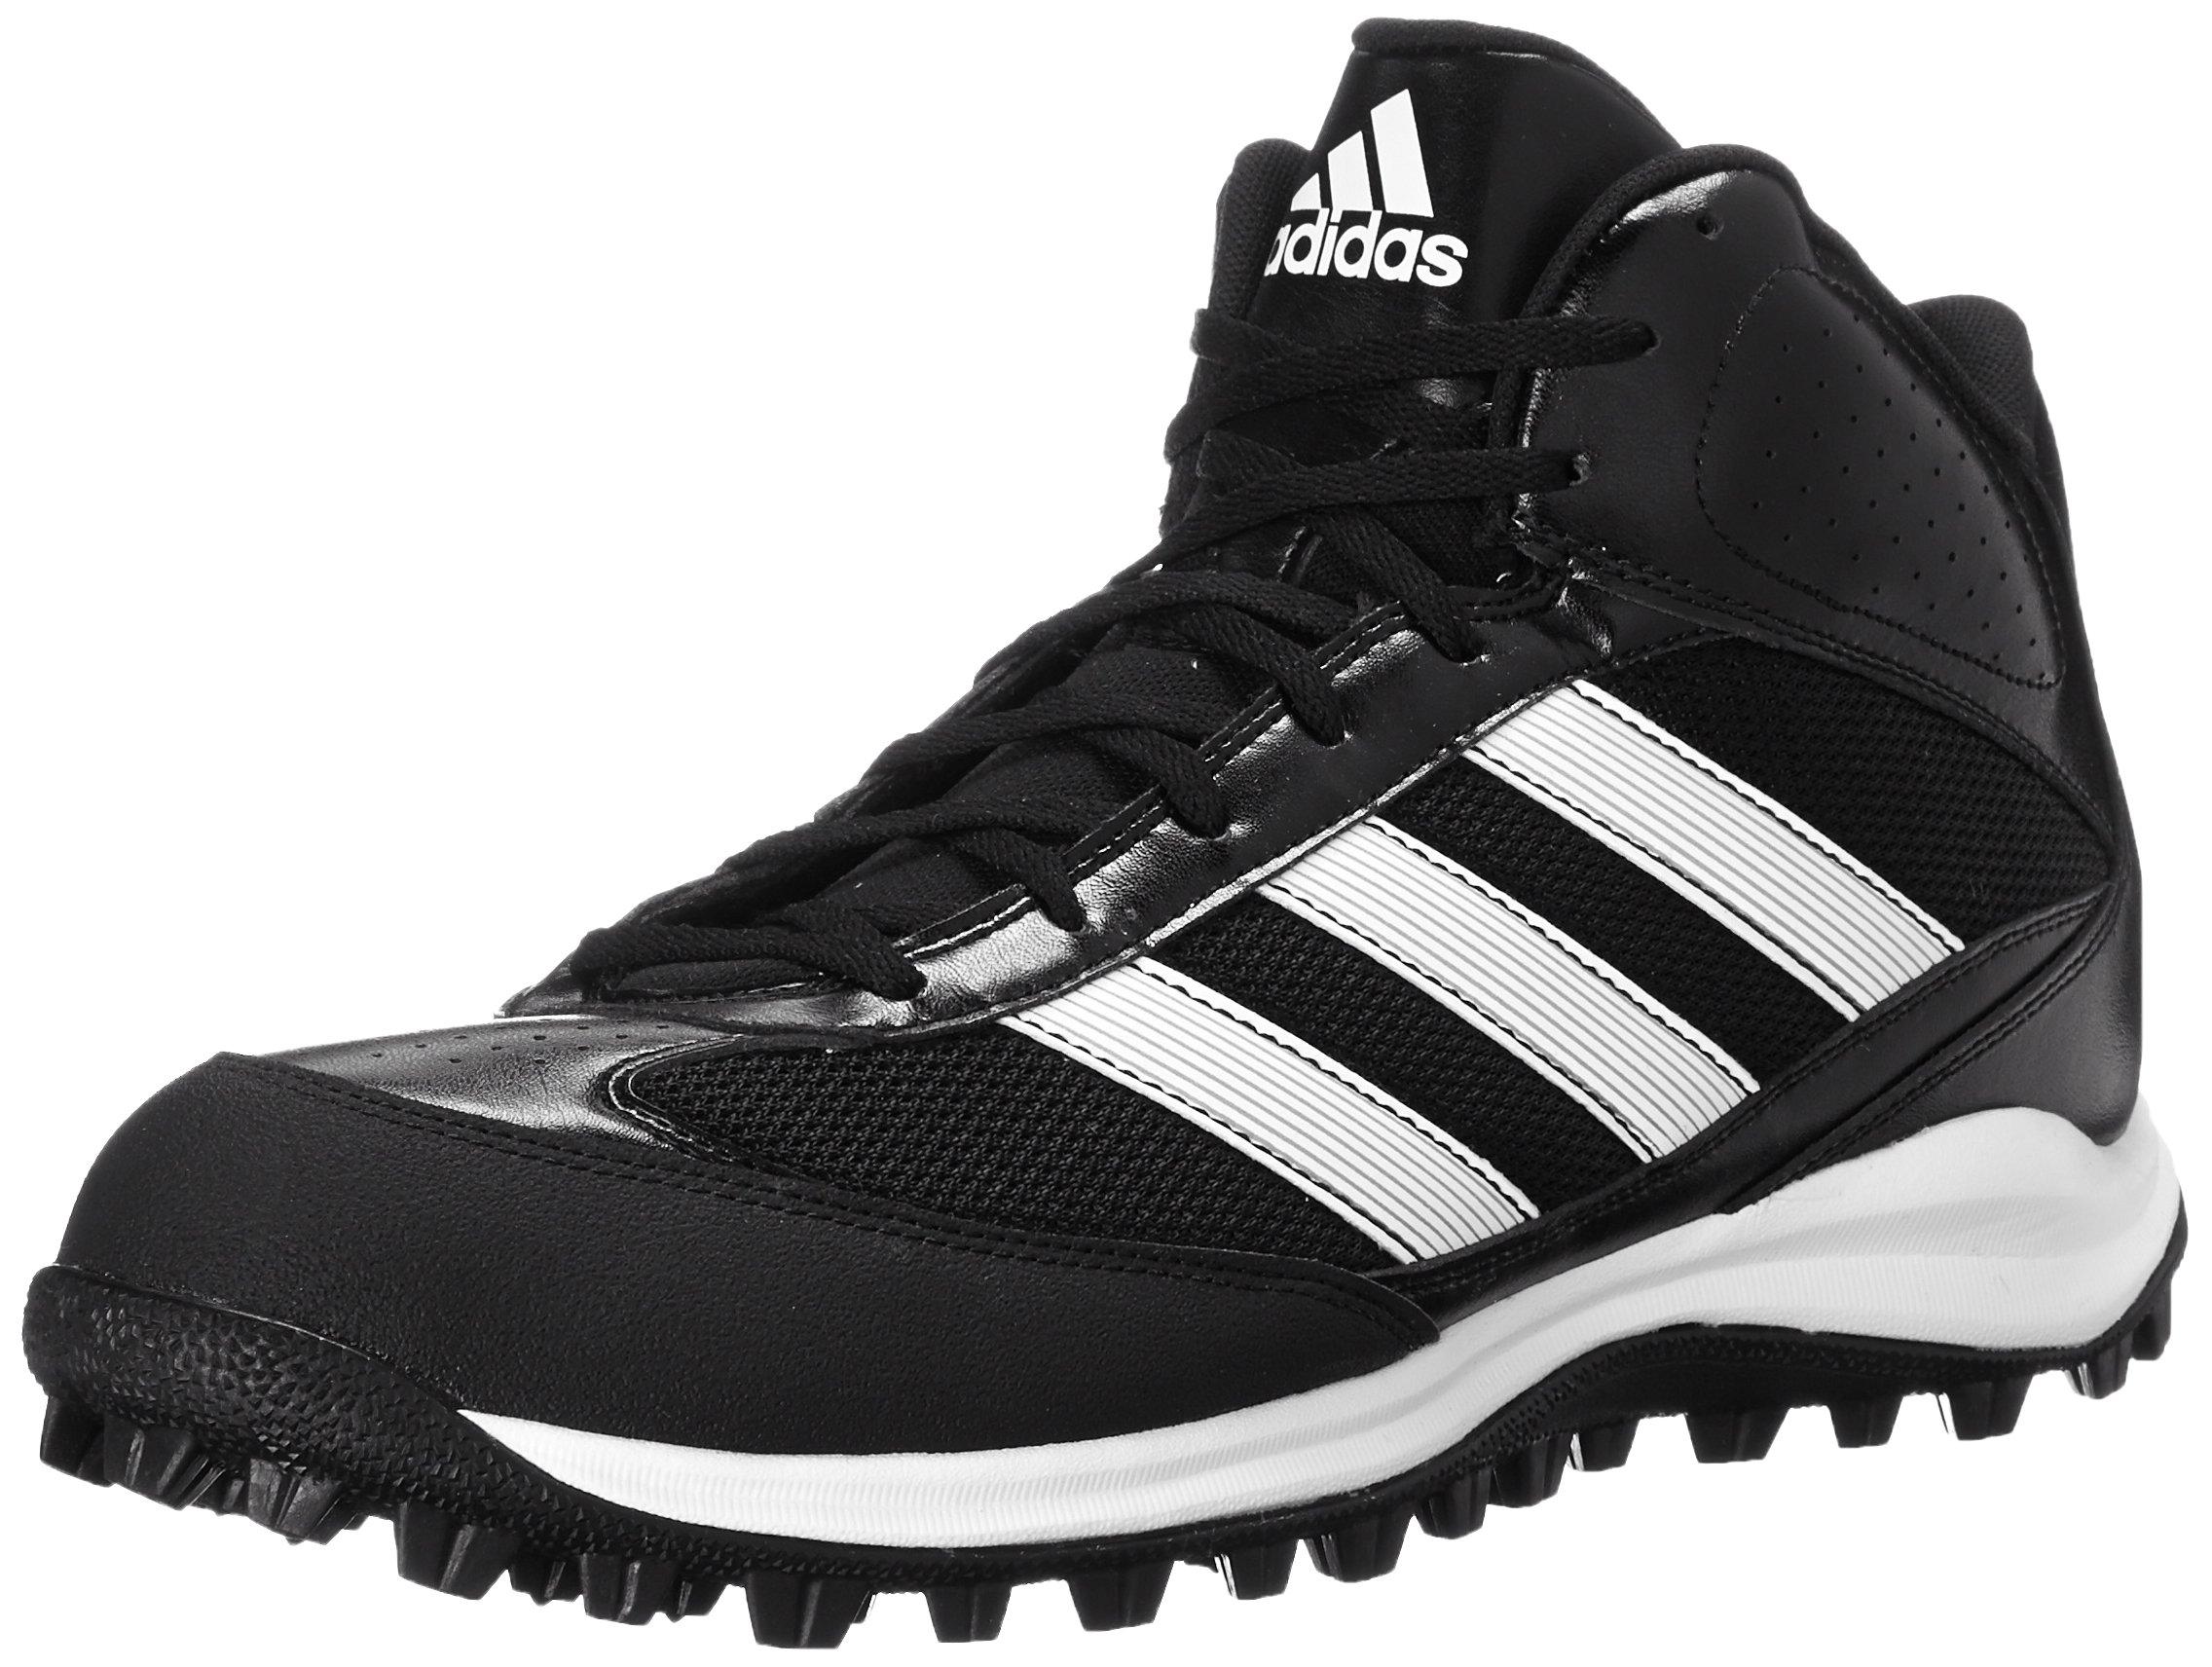 adidas Performance Men's Turf Hog LX Low Football Cleat,Black/White,6.5 M US by adidas